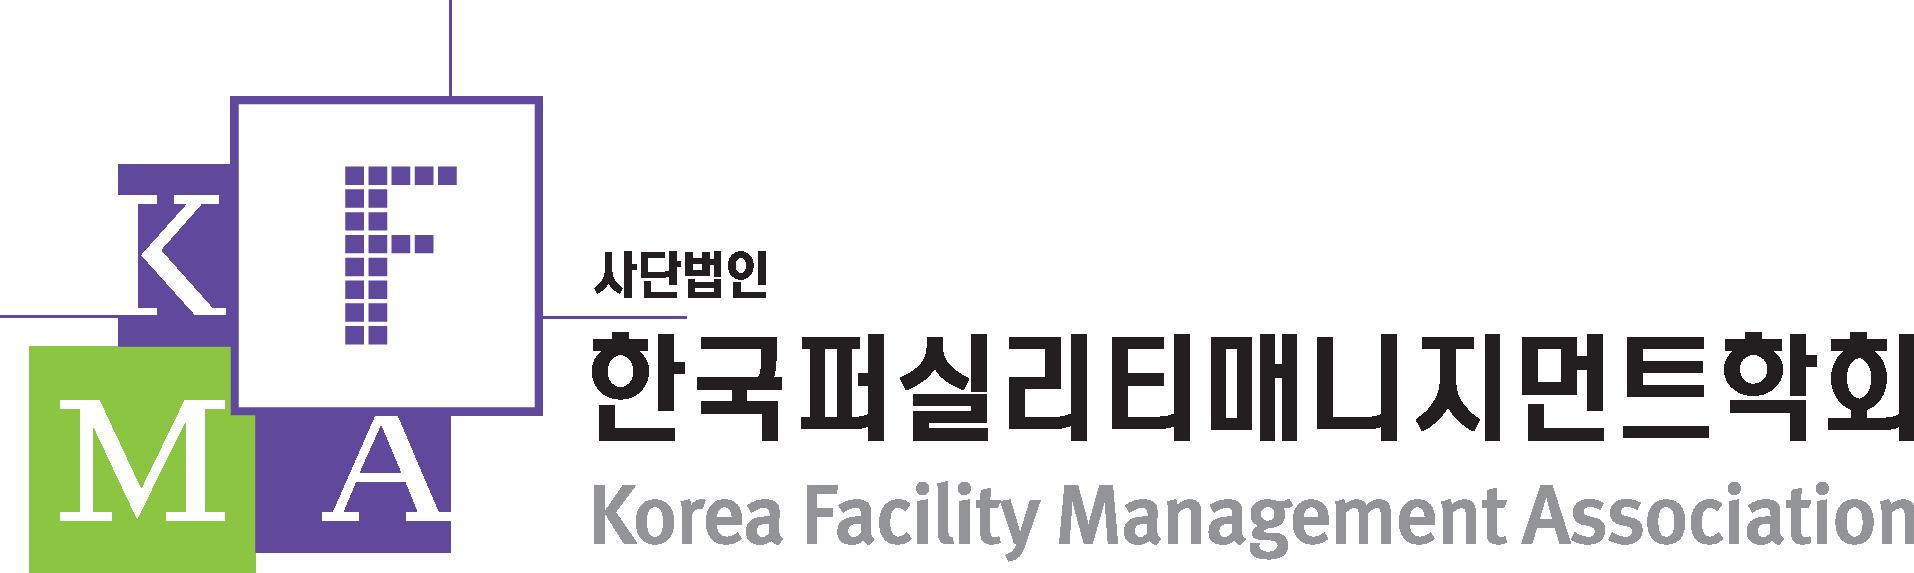 kfma_logo